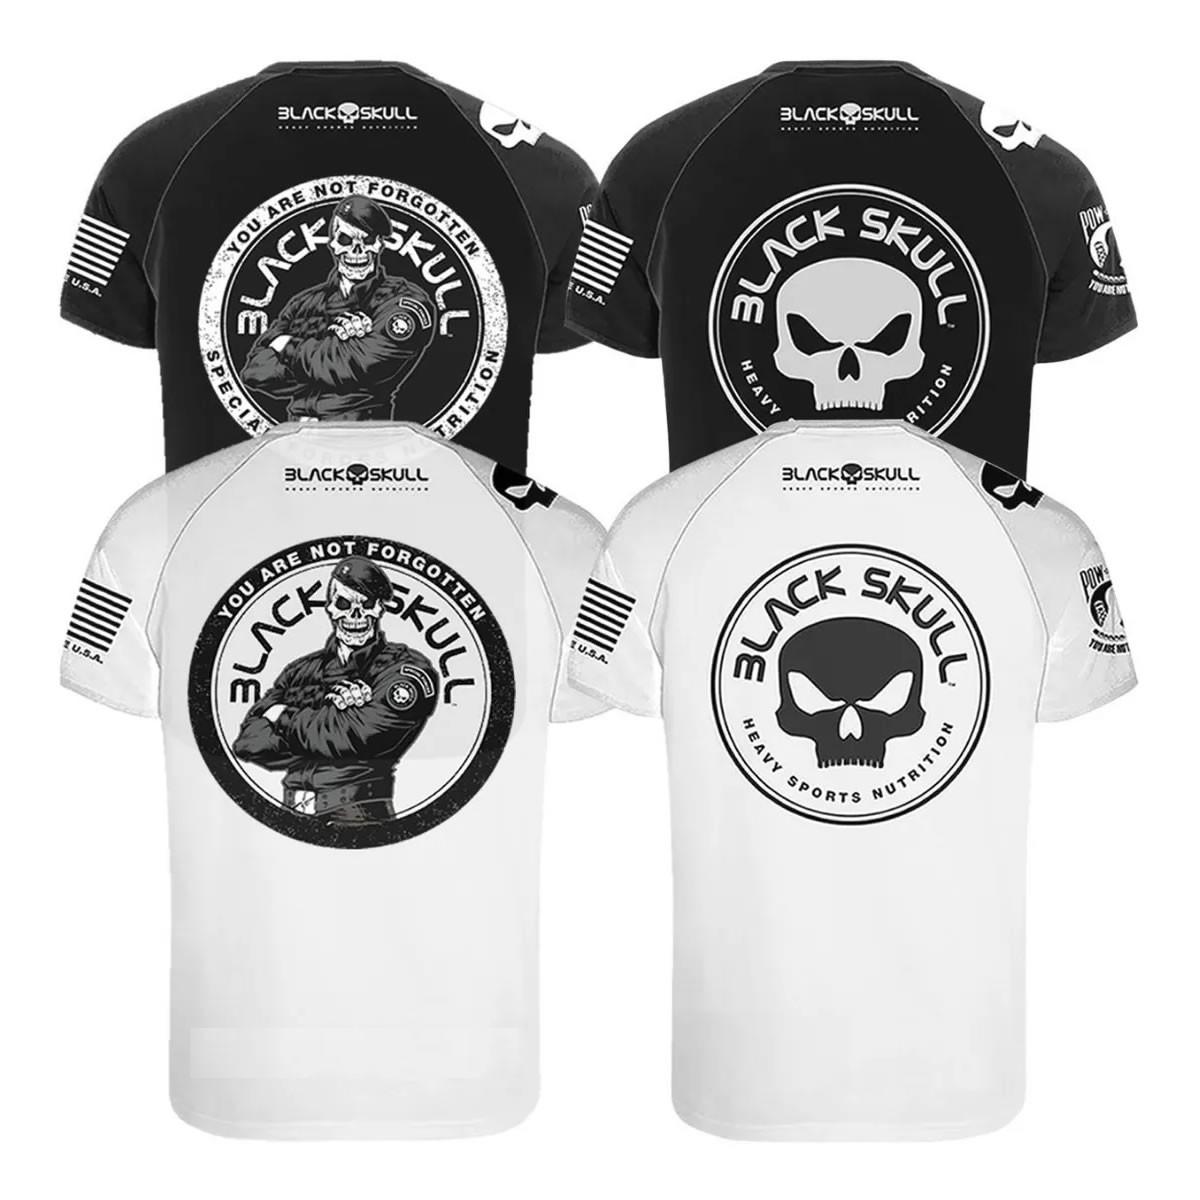 Camiseta Dry Fit - Black Skull